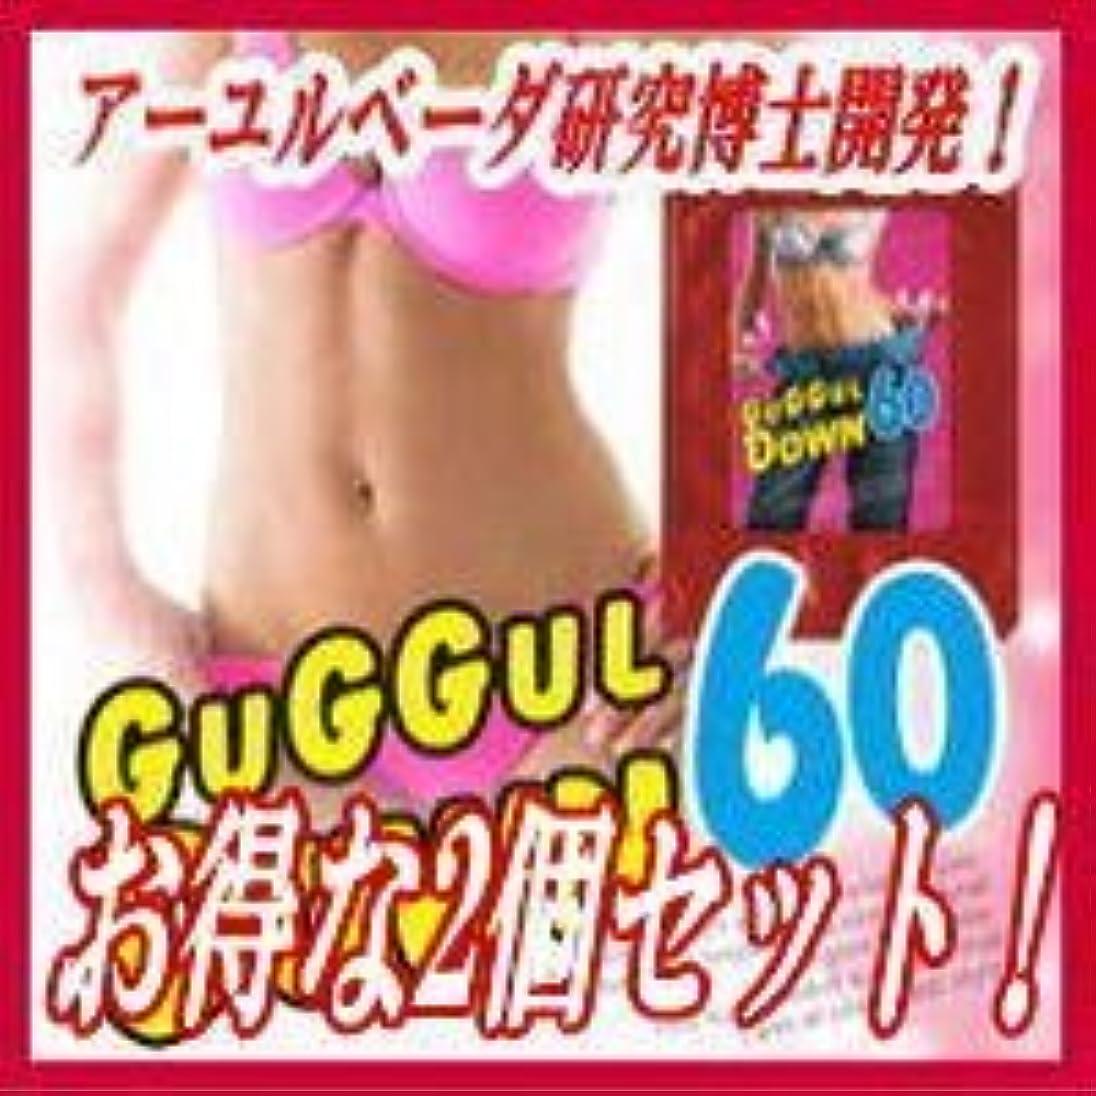 ★GUGGULDOWN60(ググルダウン60)  2個セット 痩せたくて仕方がないと集まったモニター全員が1ヵ月絶たずつぎつぎと飲用を中断!